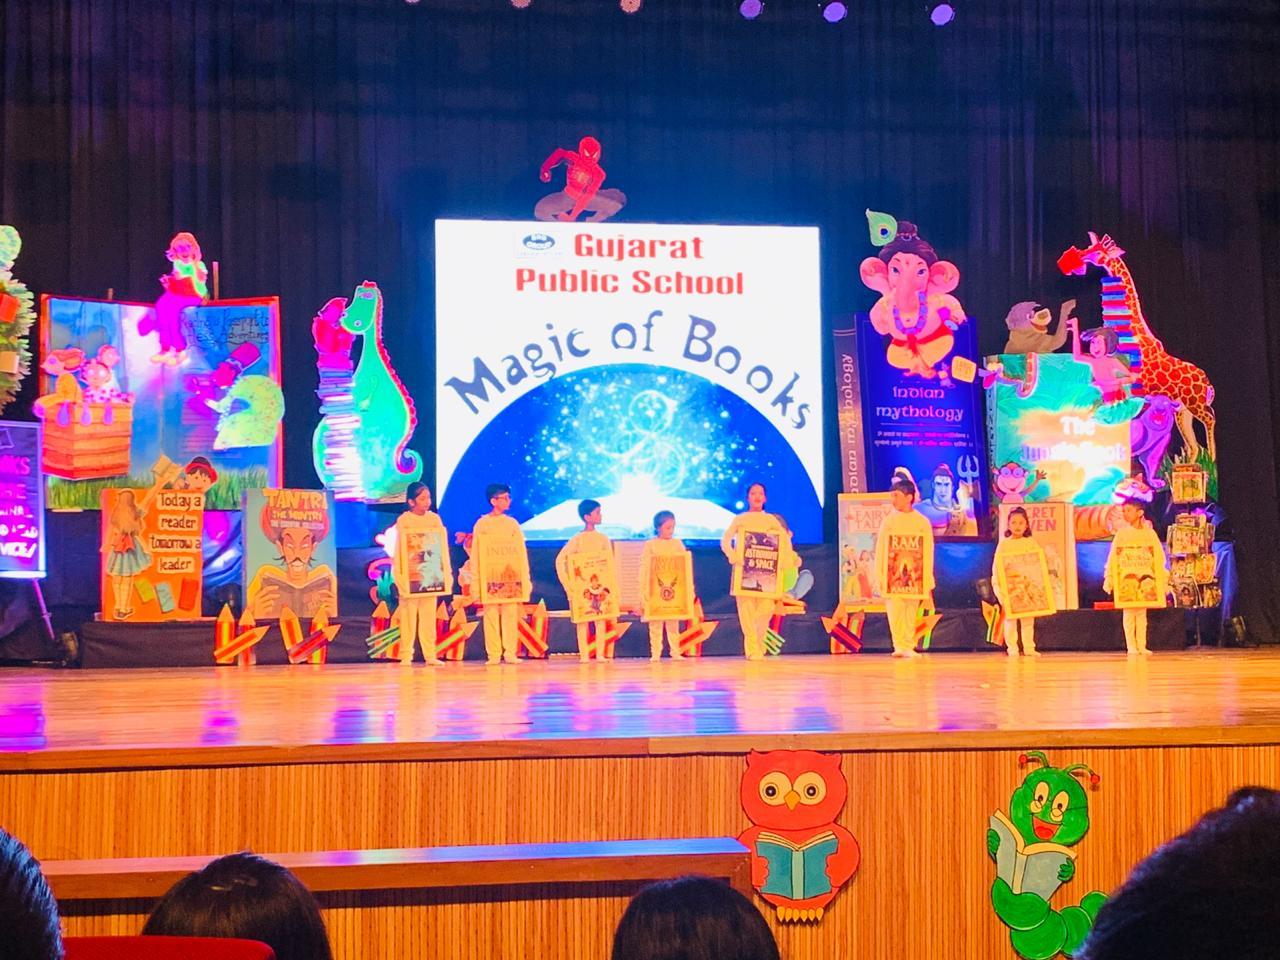 18th Annual Concert of Gujarat Public School Baroda